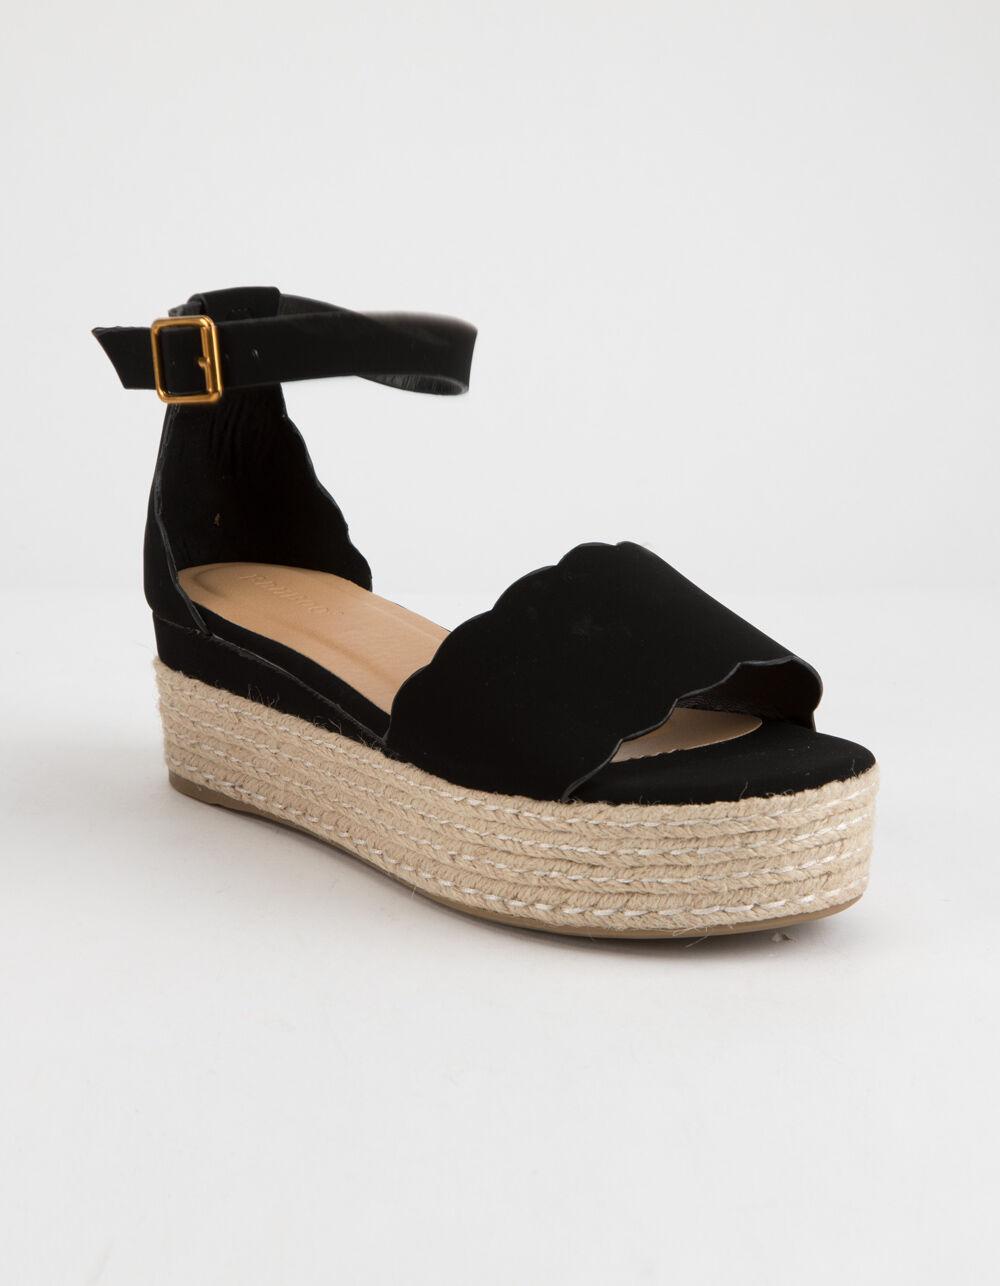 BAMBOO Scallop Espadrille Black Platform Sandals